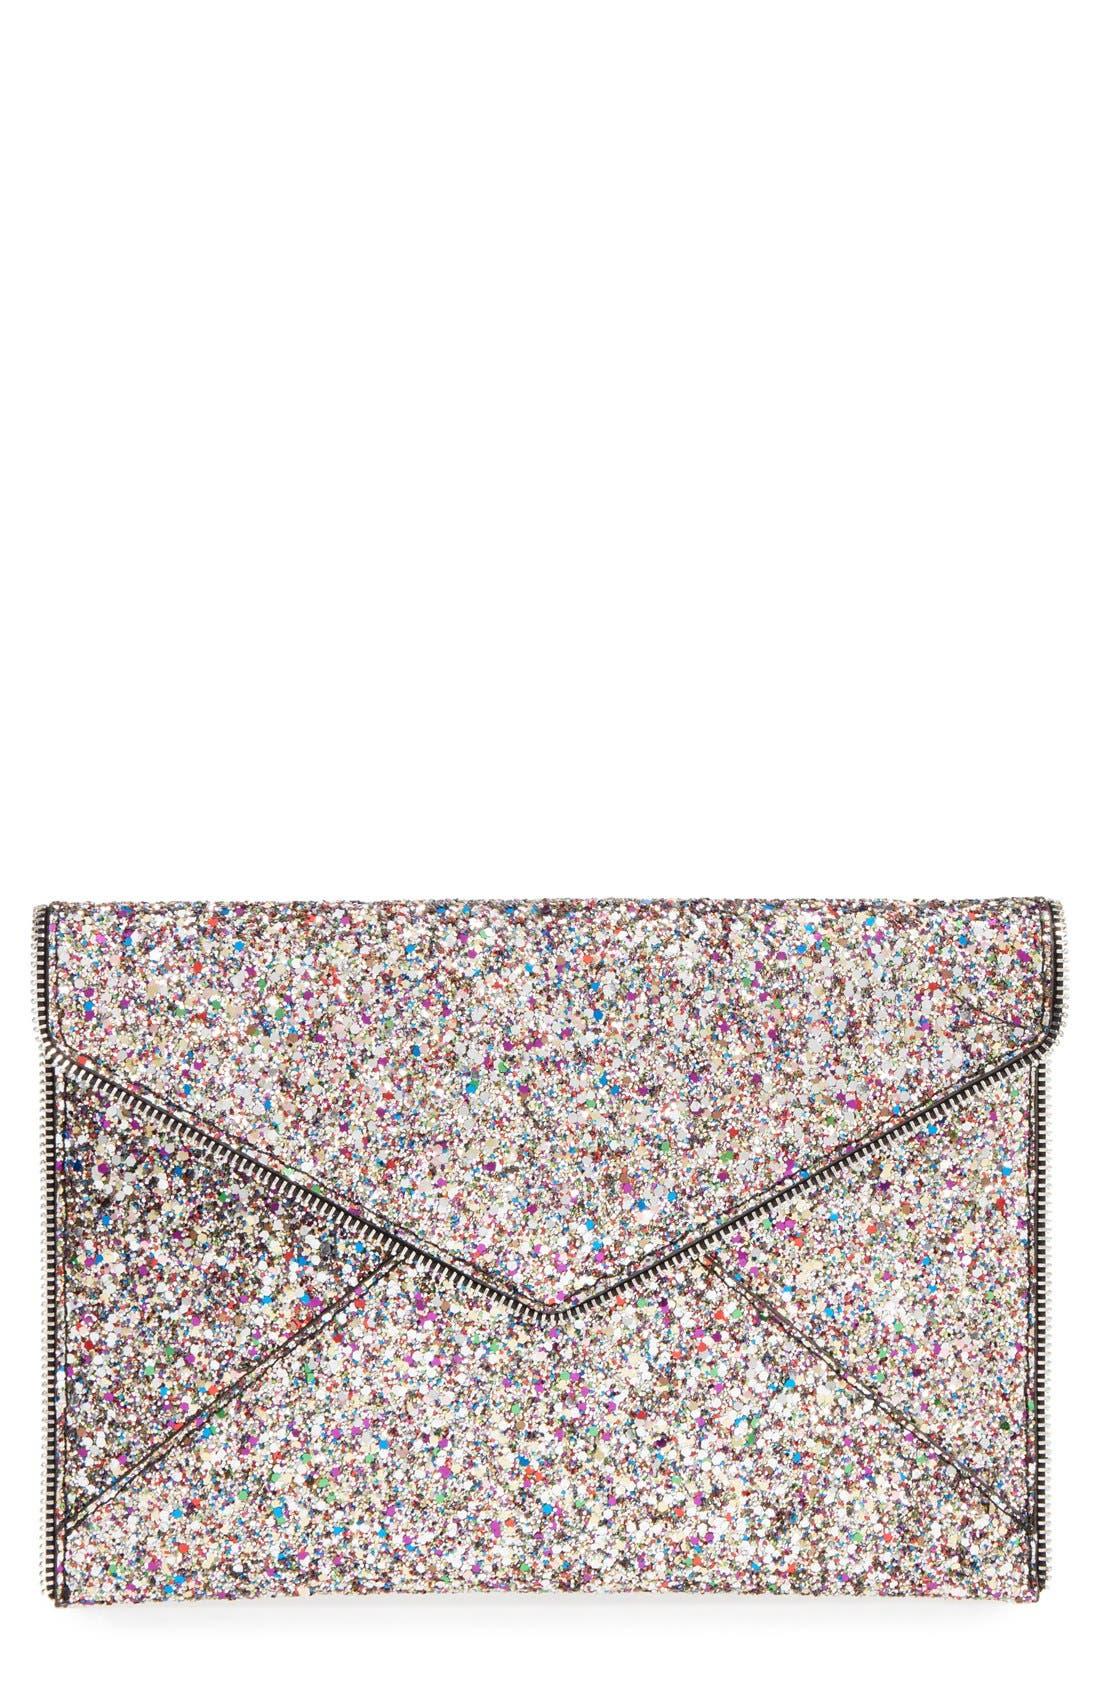 'Leo' Envelope Clutch,                         Main,                         color, Silver/ Silver Hrdwr